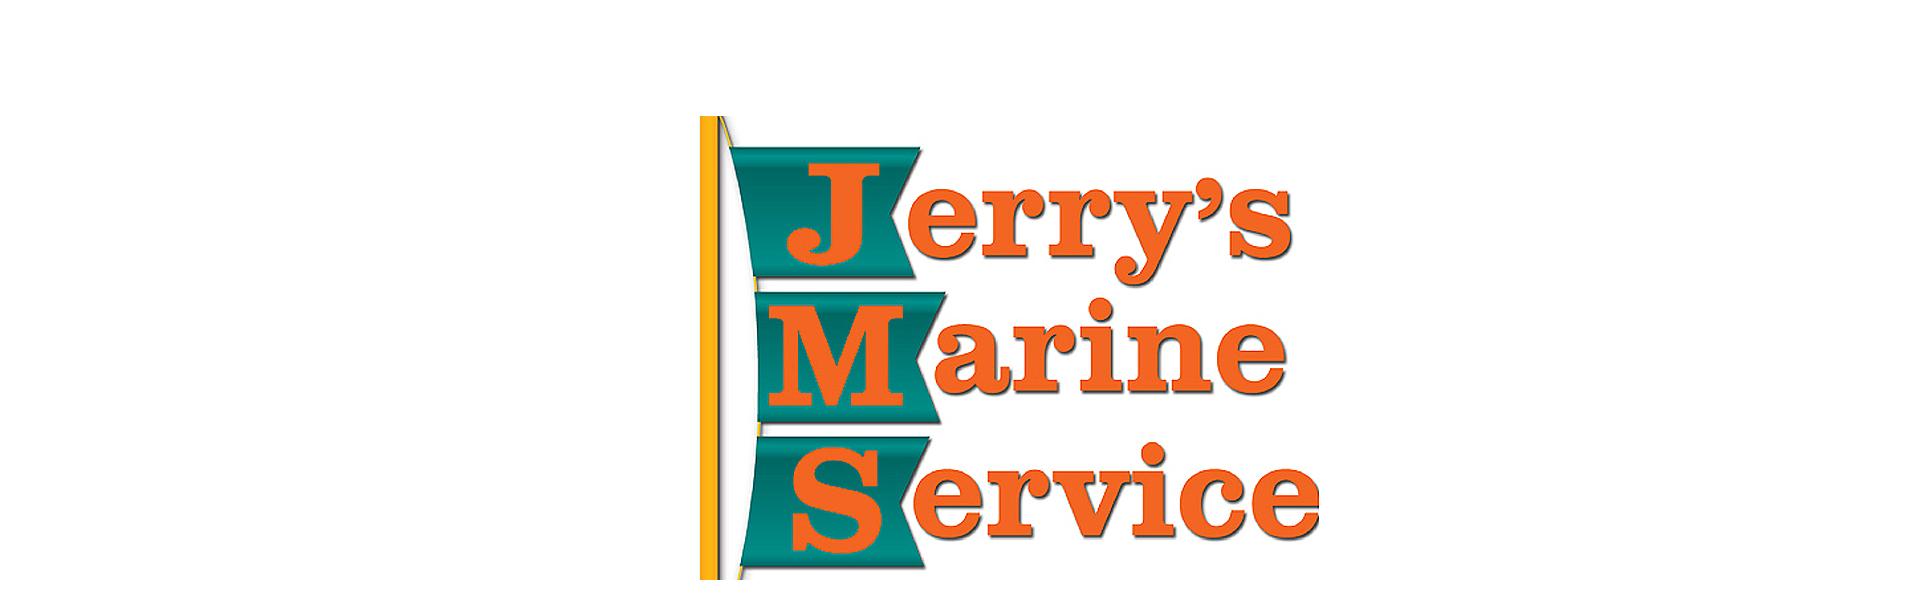 MIASF Business Spotlight: Jerry's Marine Service